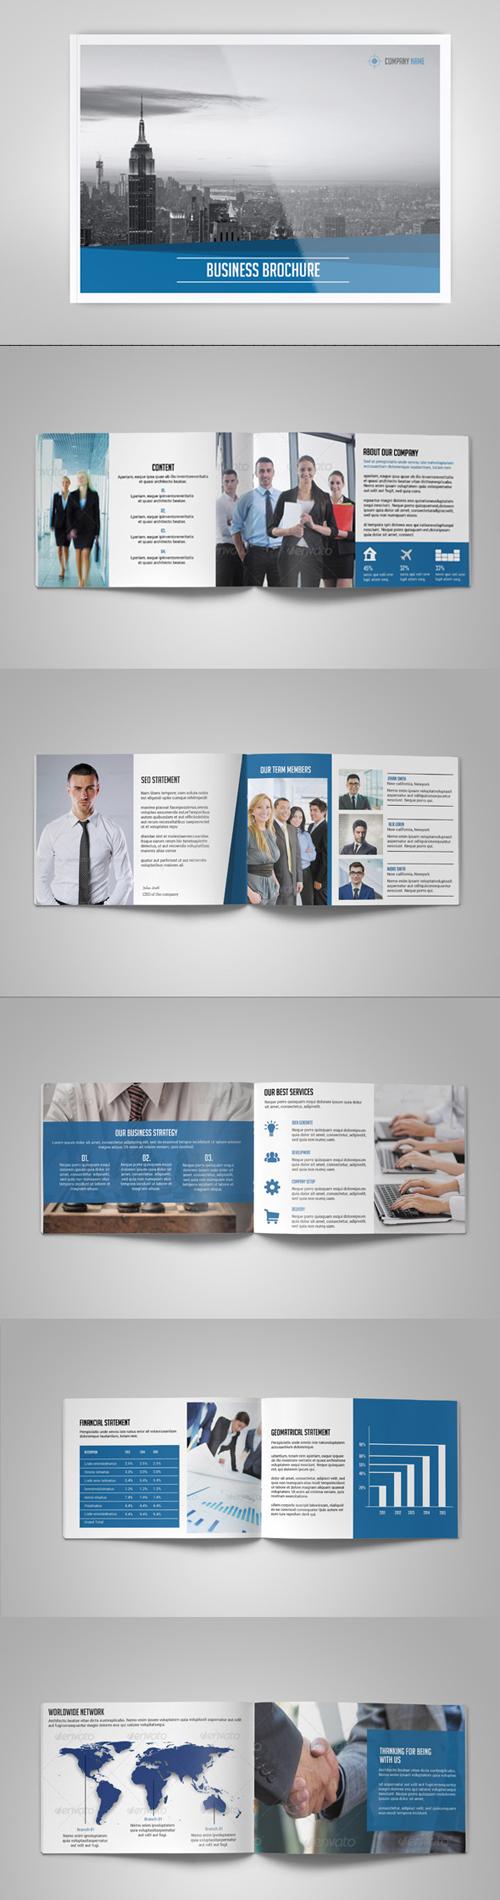 Business Brochure / Catalog Template